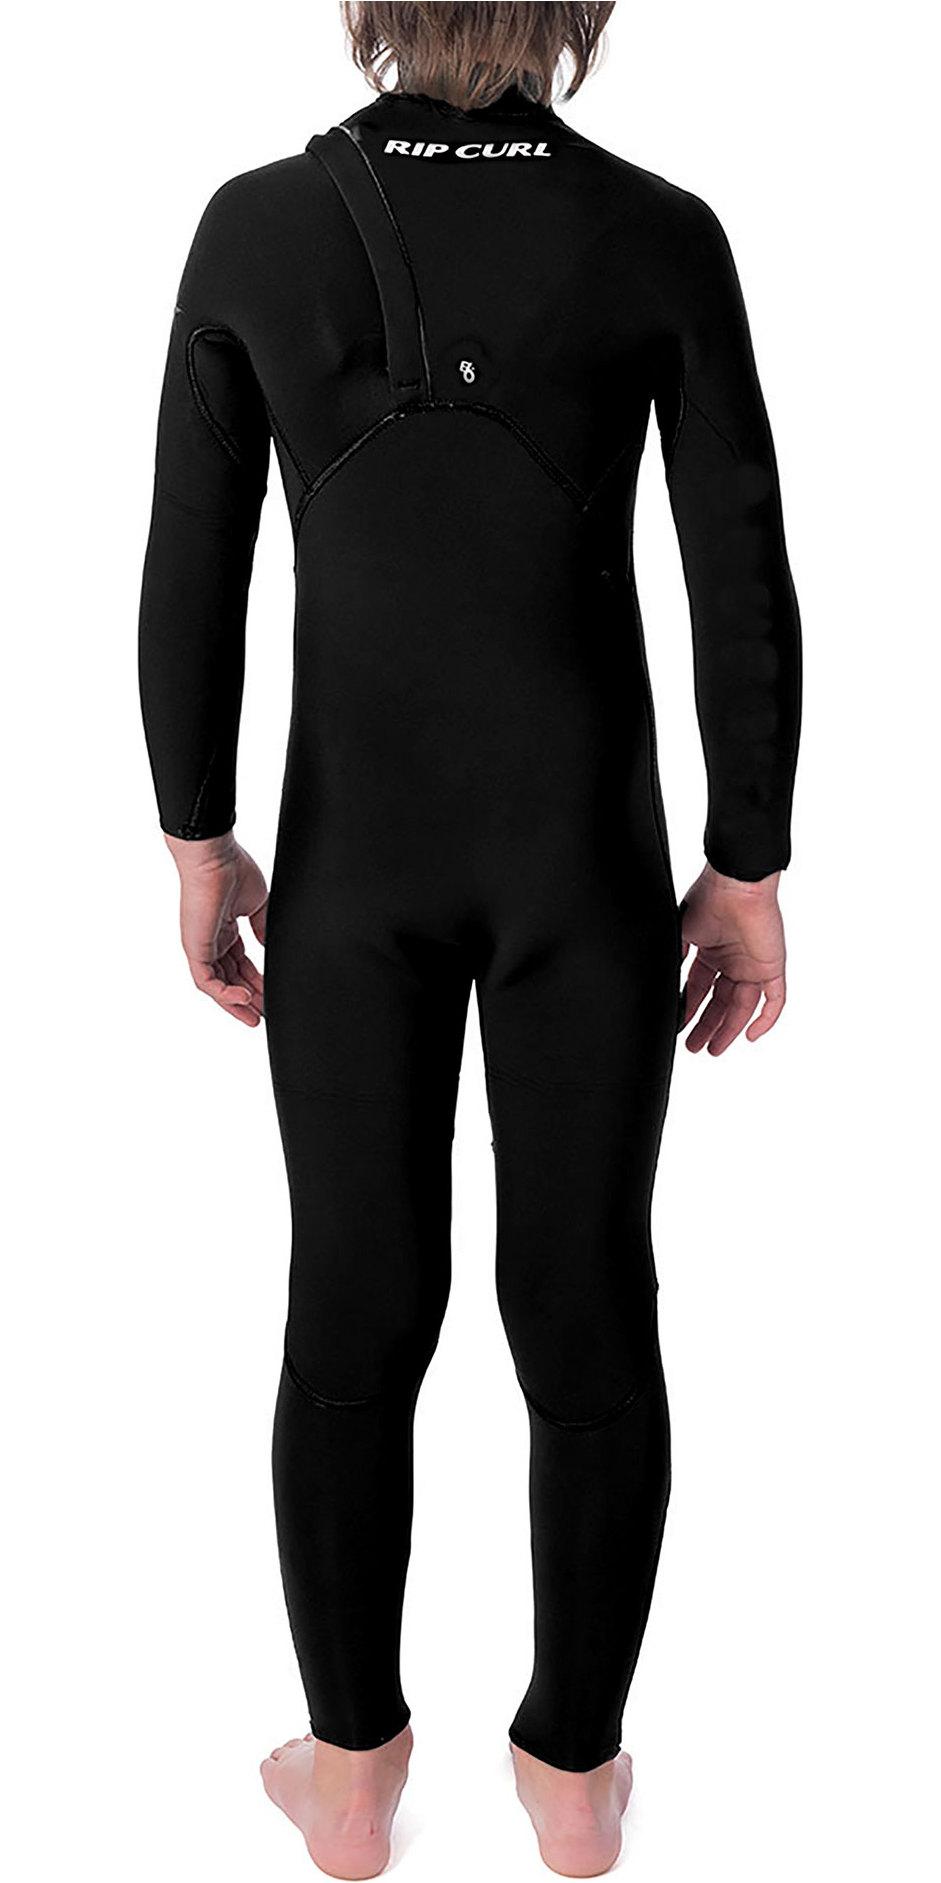 2020 Rip Curl Junior Flashbomb 5/3mm Zipperless Wetsuit Black WSM9XB